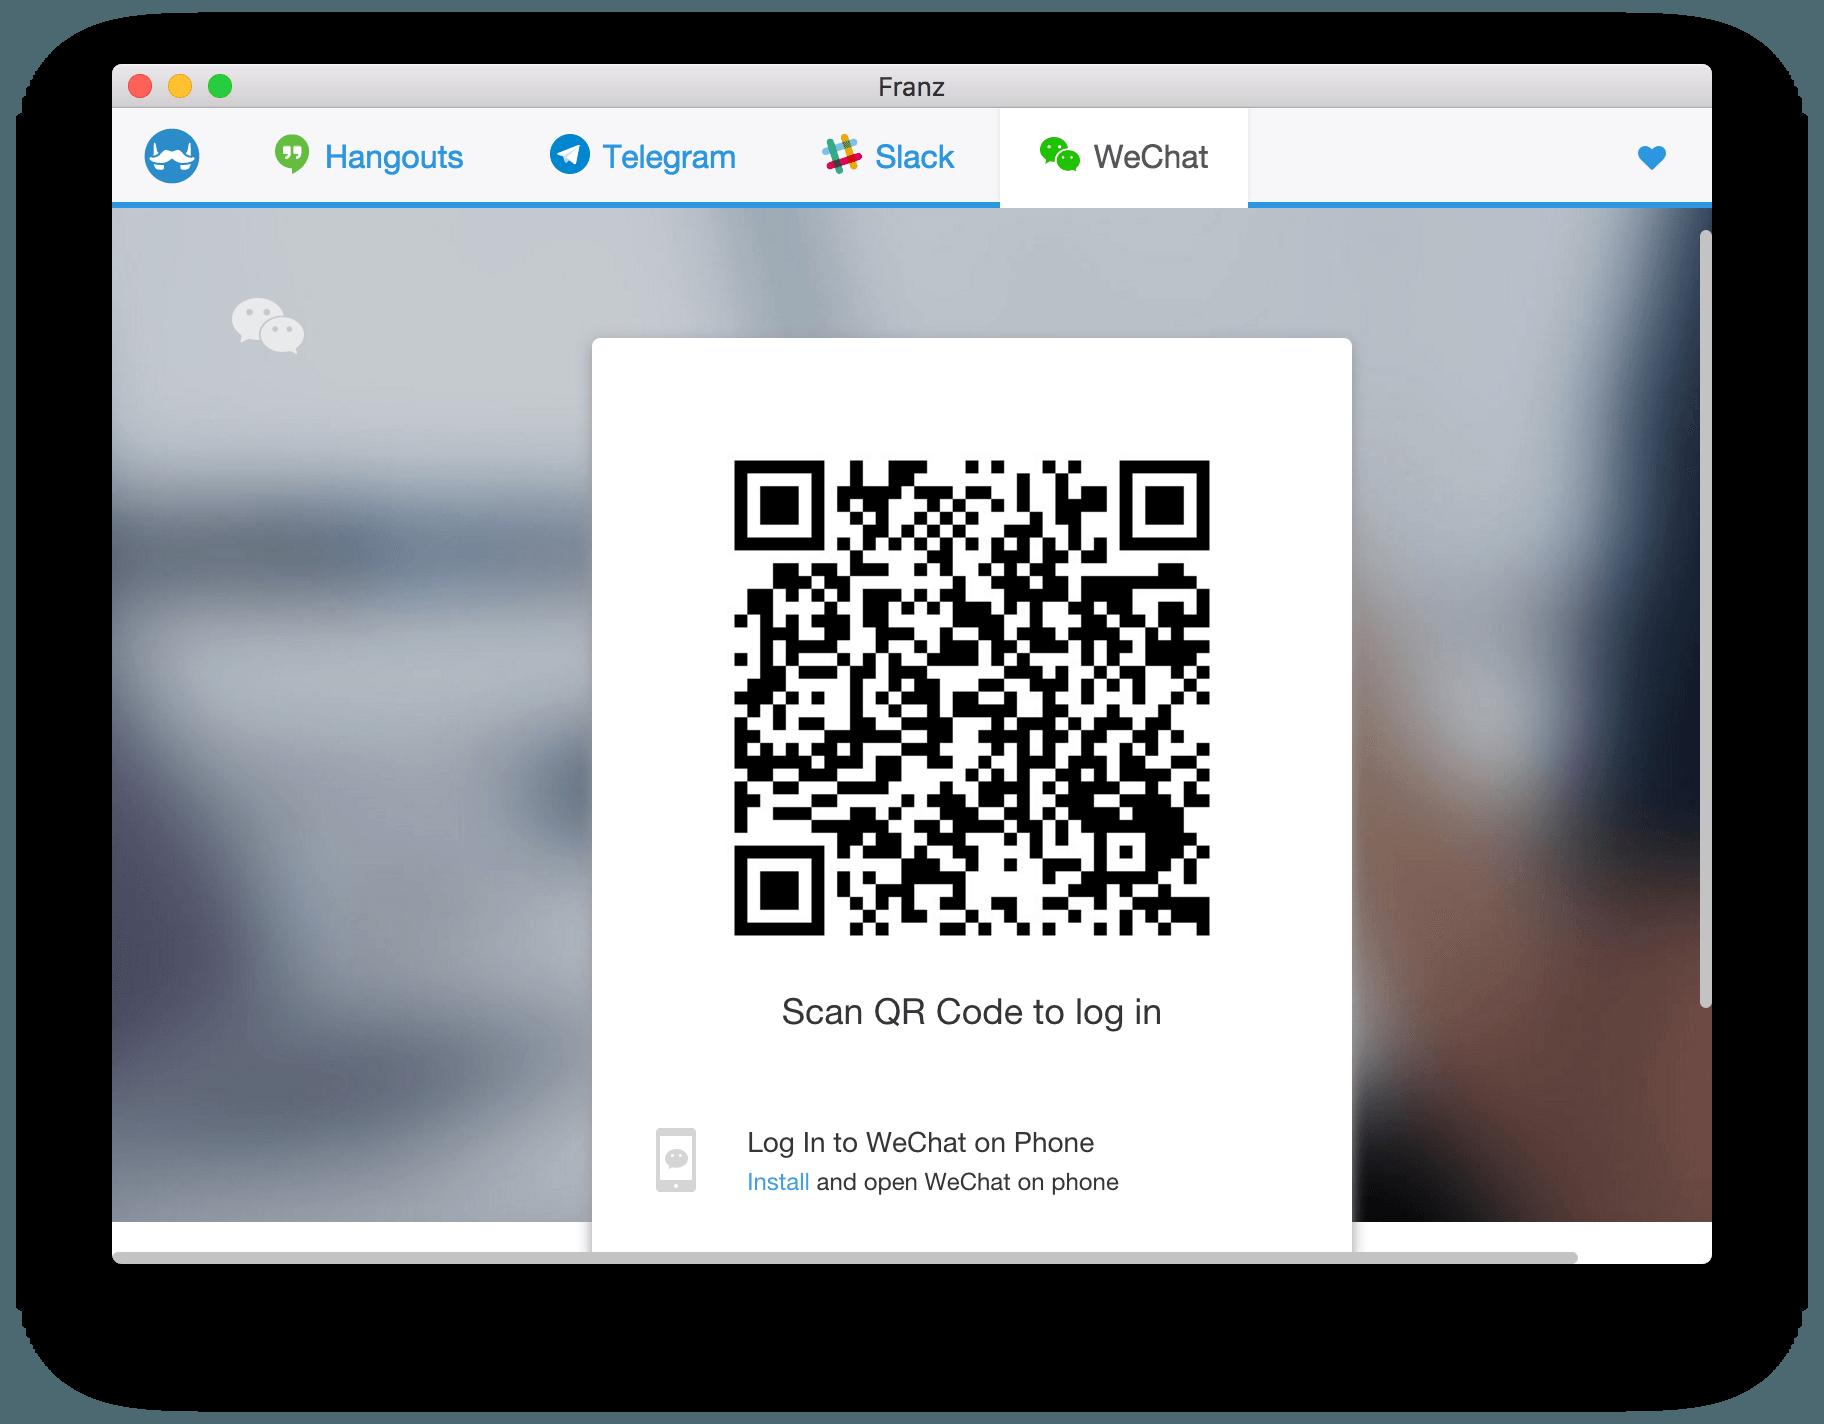 Franz:集合微信、Slack、Telegram 等服务的桌面社交客户端插图2